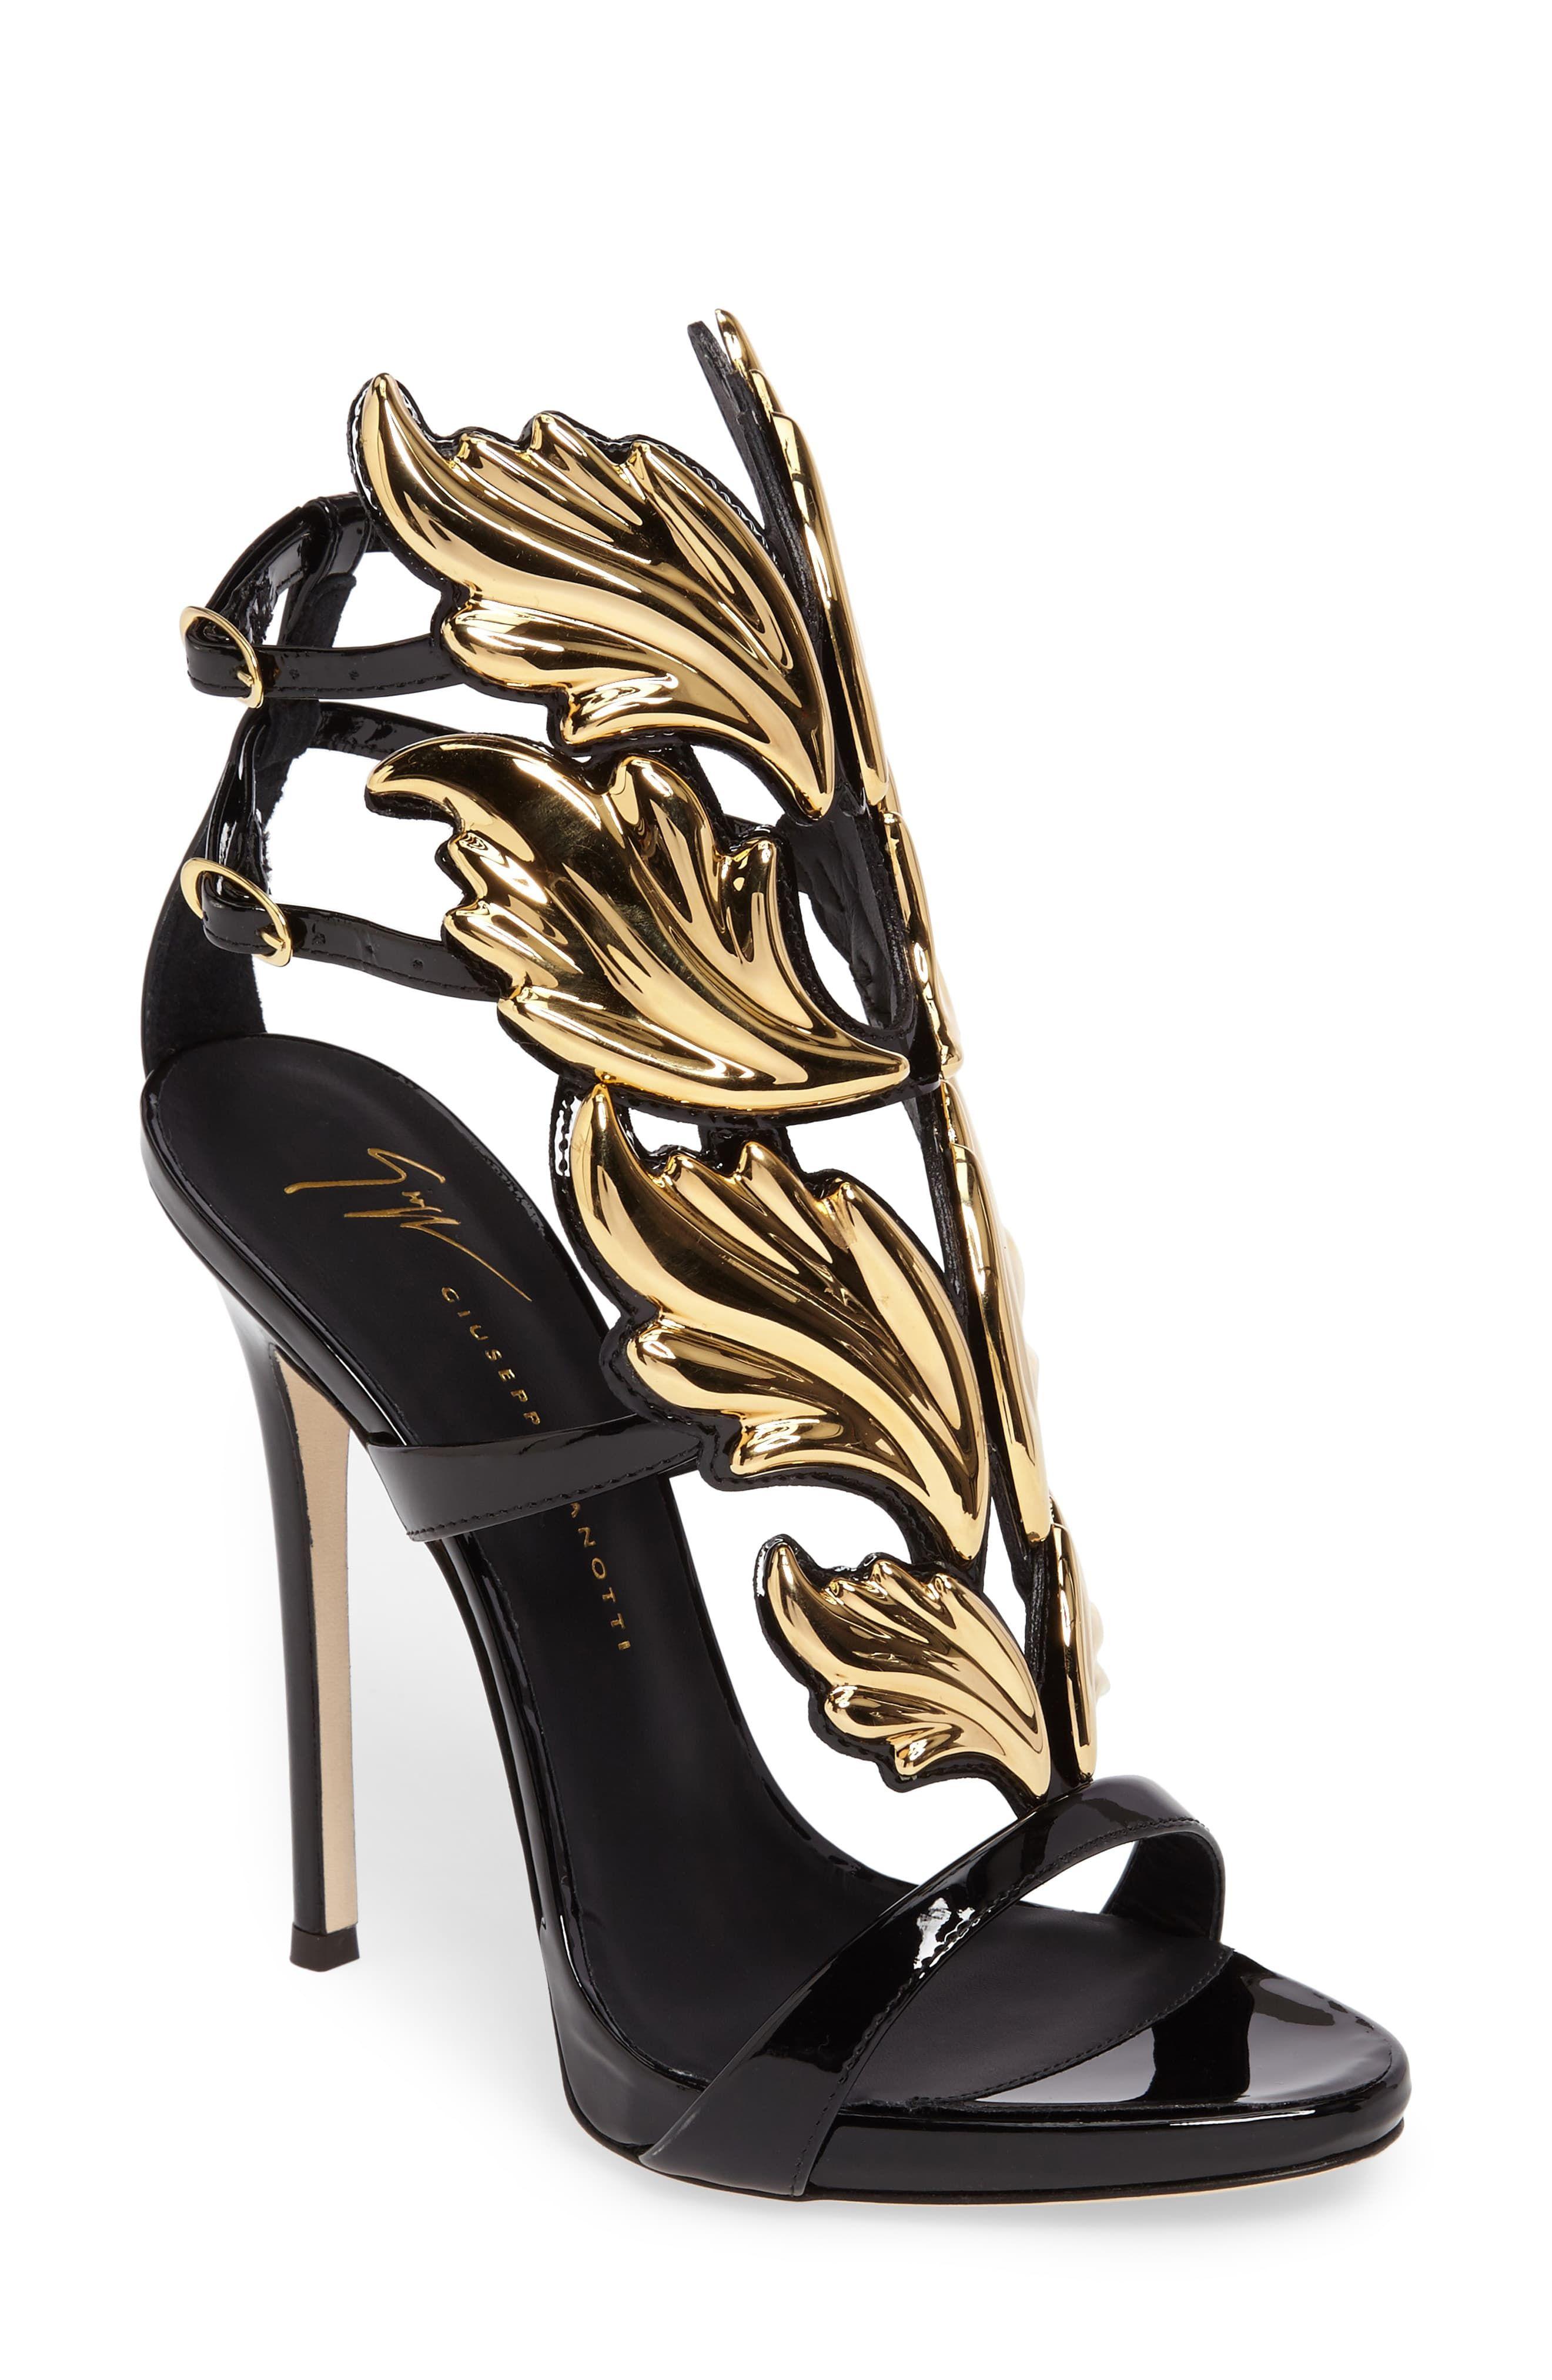 504e6e08f Women's Giuseppe Zanotti Cruel Wing Sandal, Size 8 M - Black ...